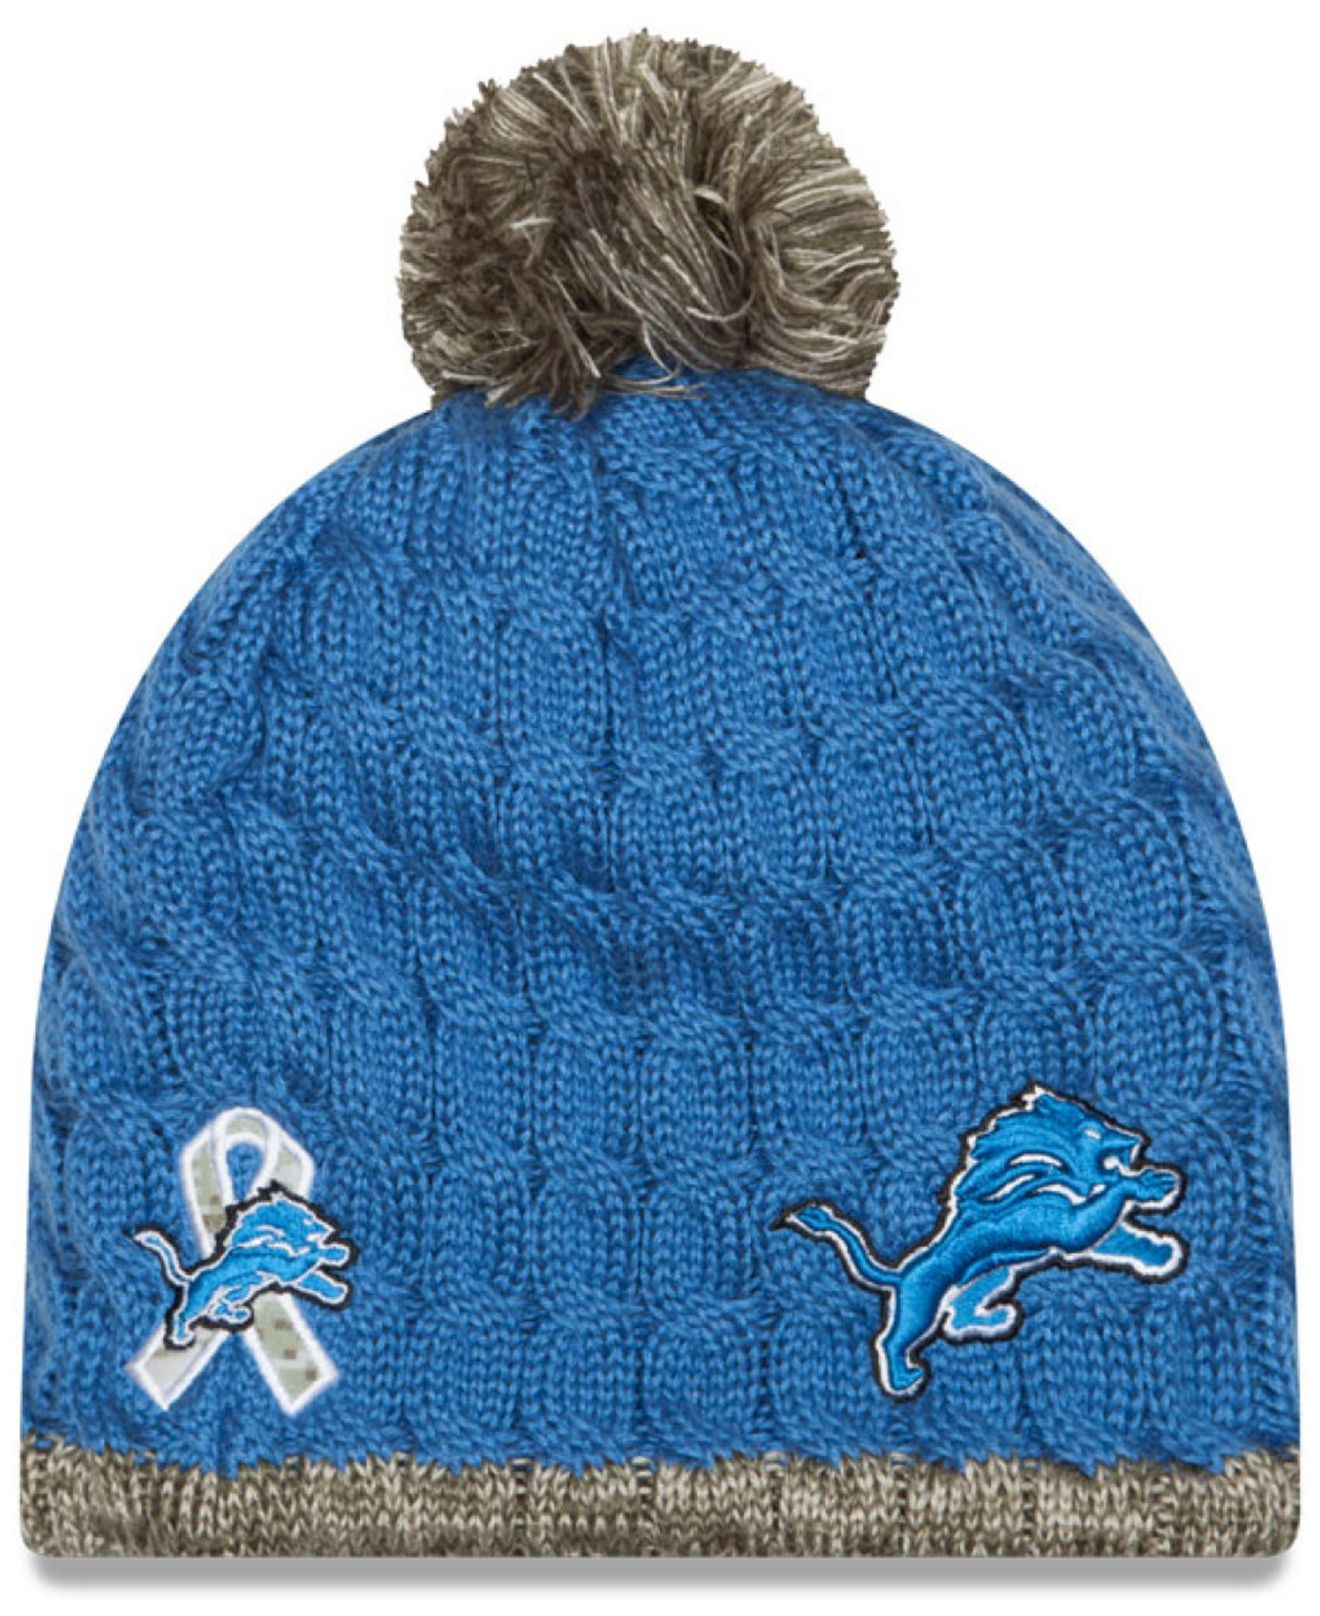 Lyst - KTZ Women s Detroit Lions Salute To Service Knit Hat in Blue ... ba563da0e